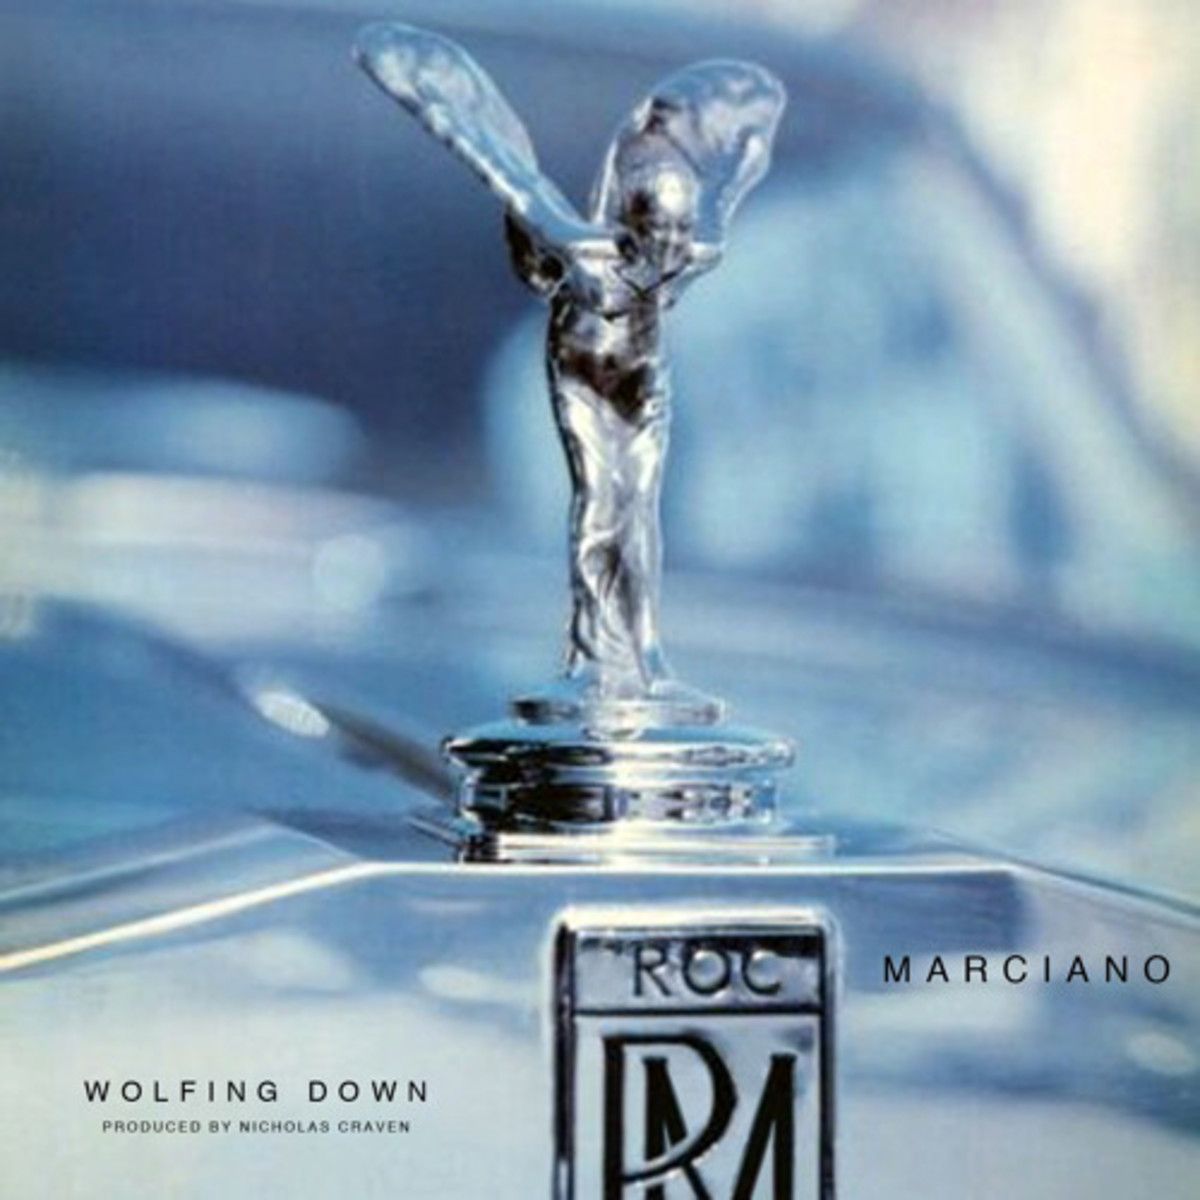 roc-marciano-wolfing-down.jpg